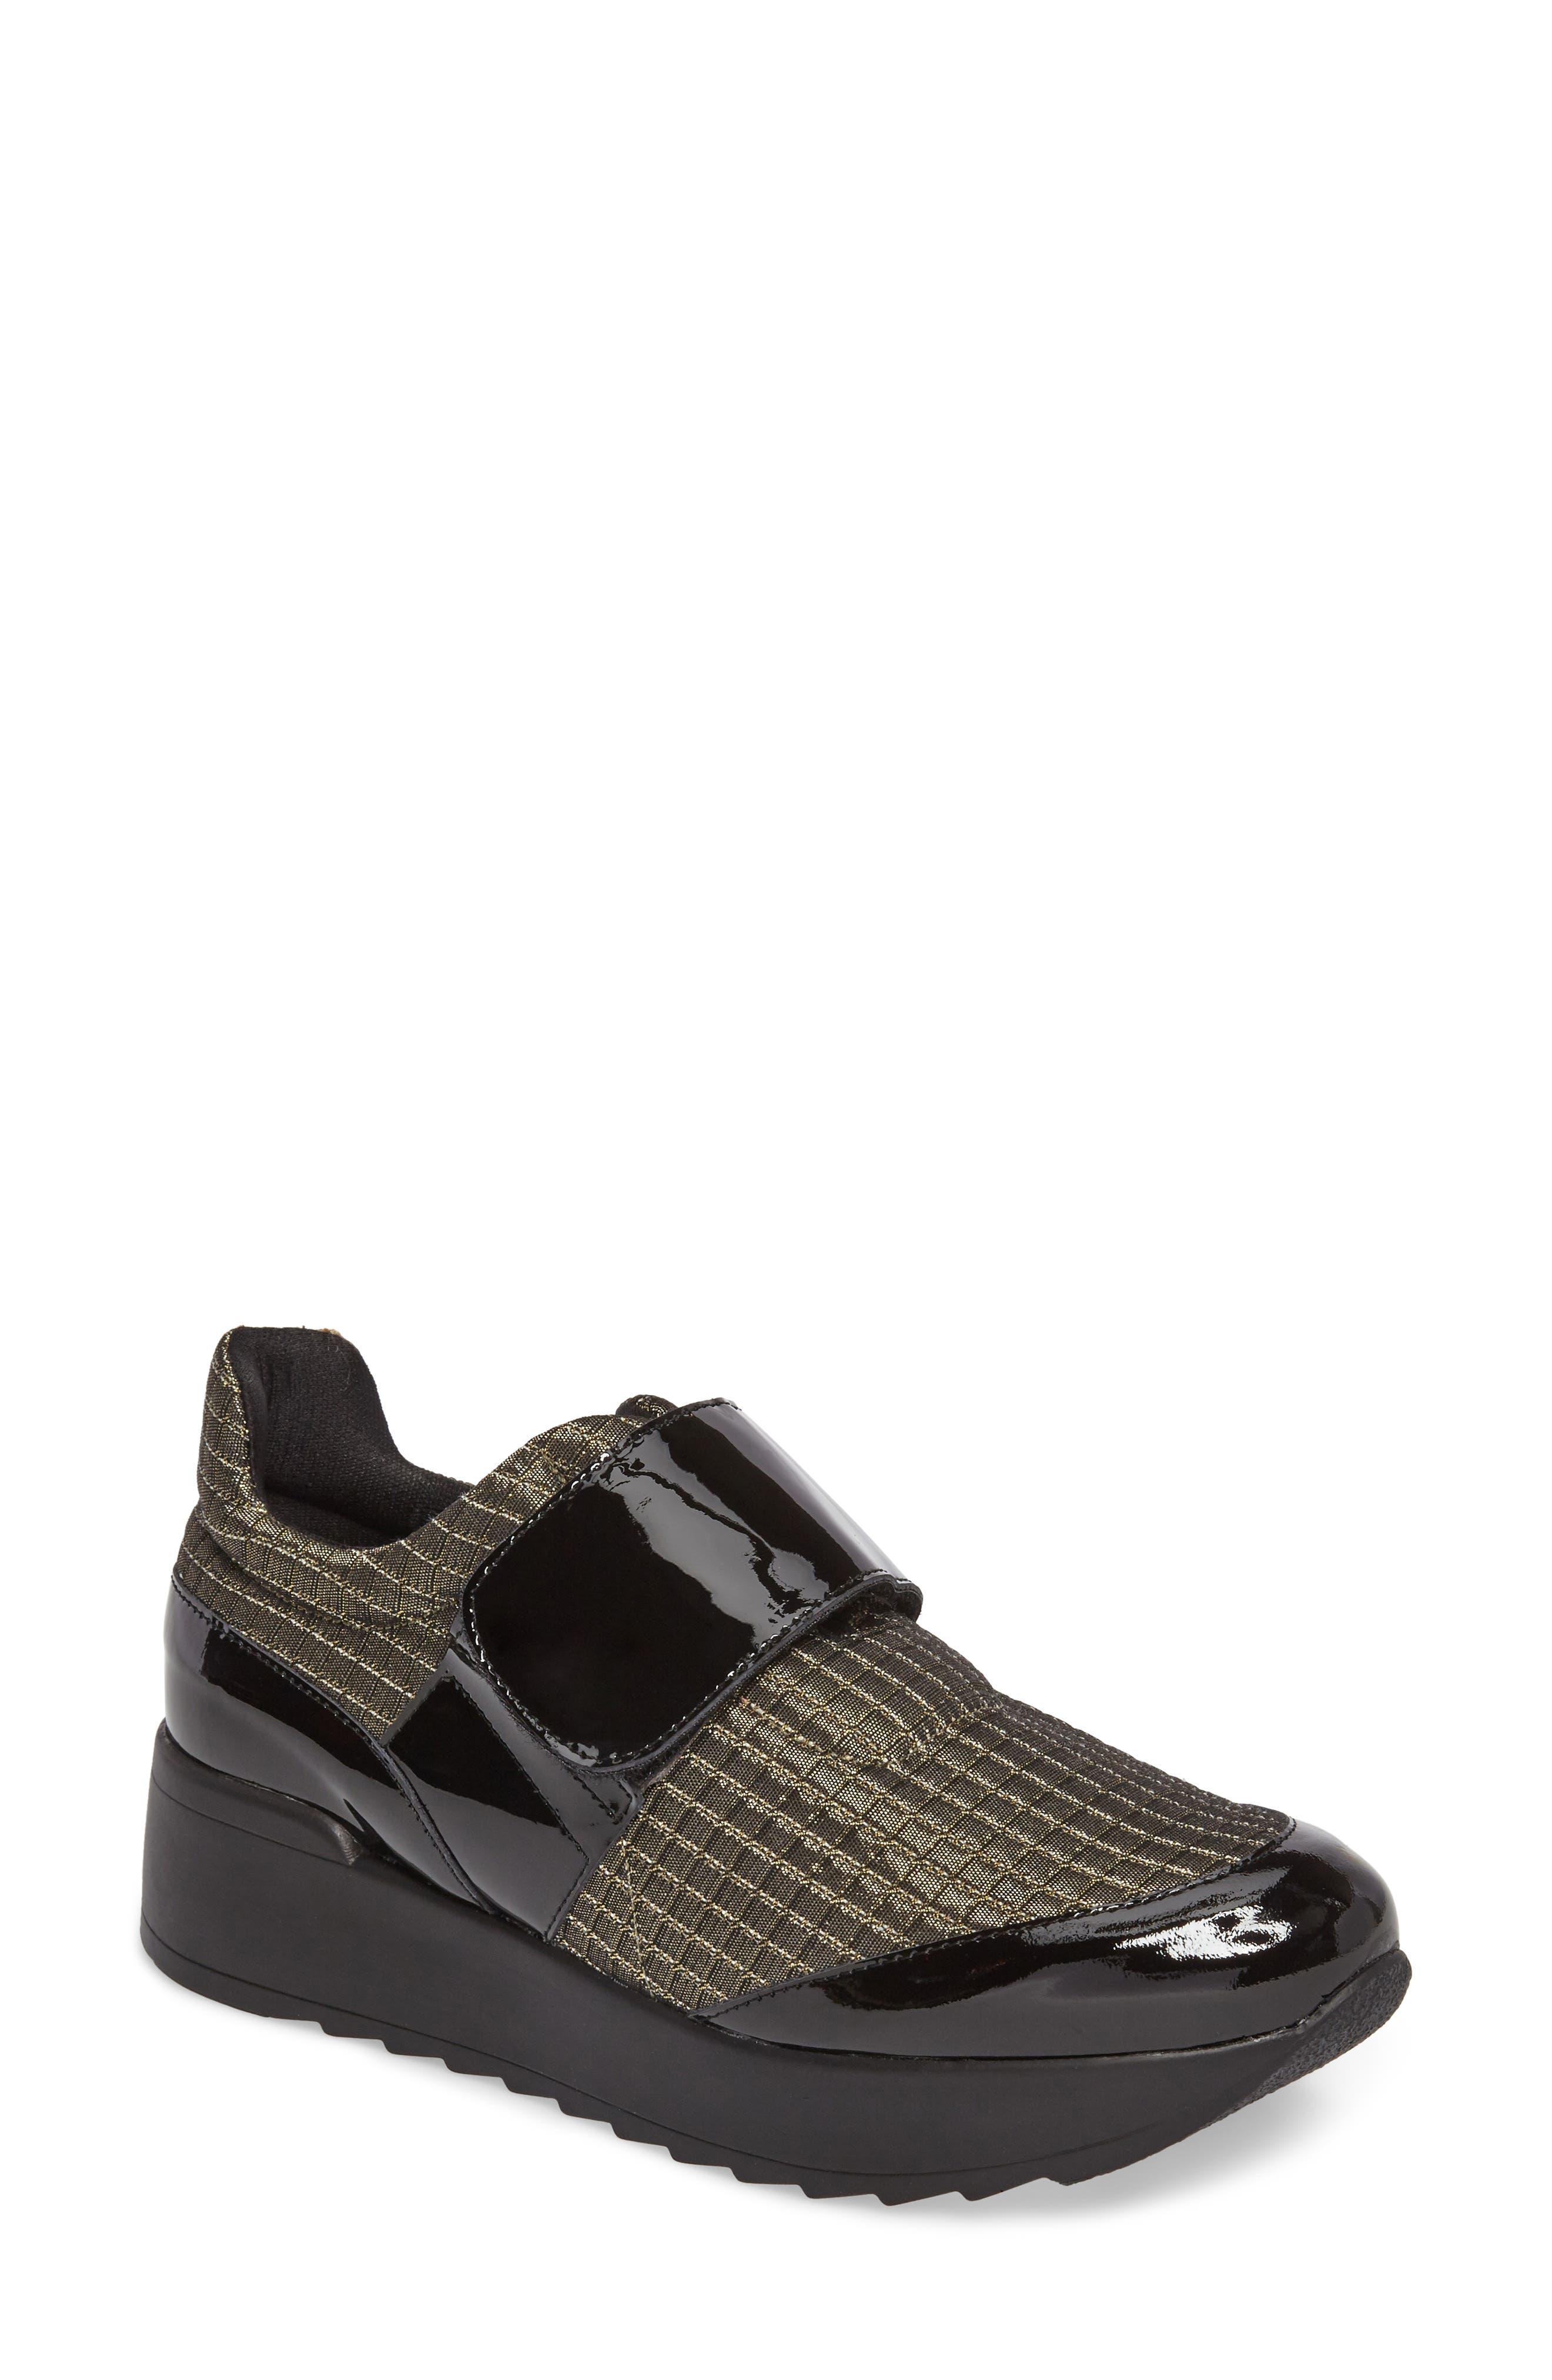 Cannon Sneaker,                             Main thumbnail 1, color,                             001